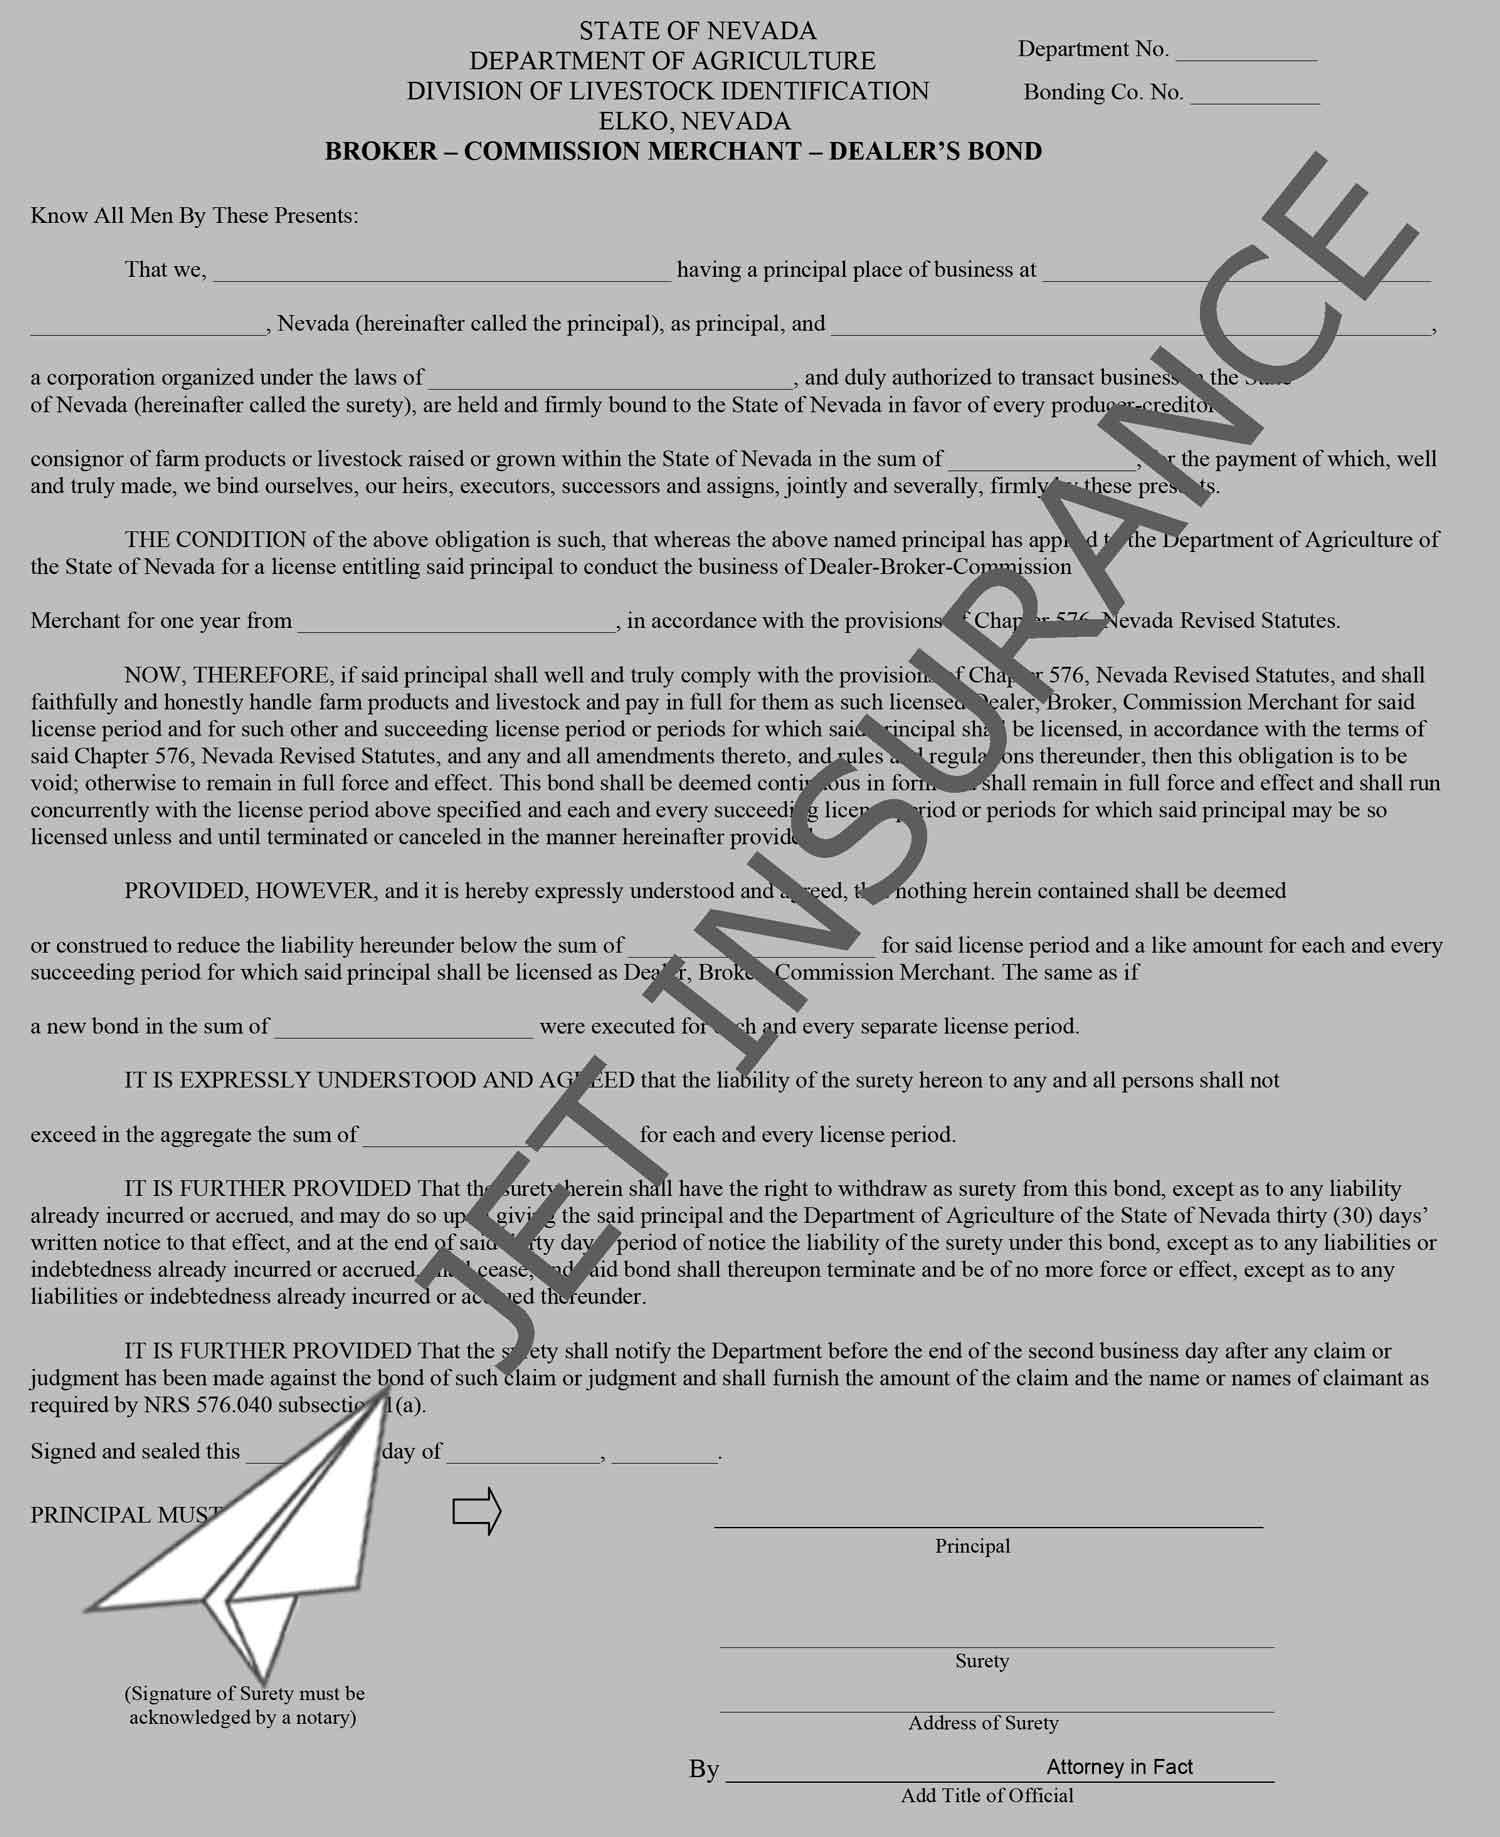 Nevada Livestock Dealer, Broker, and Commission Merchant Bond Form